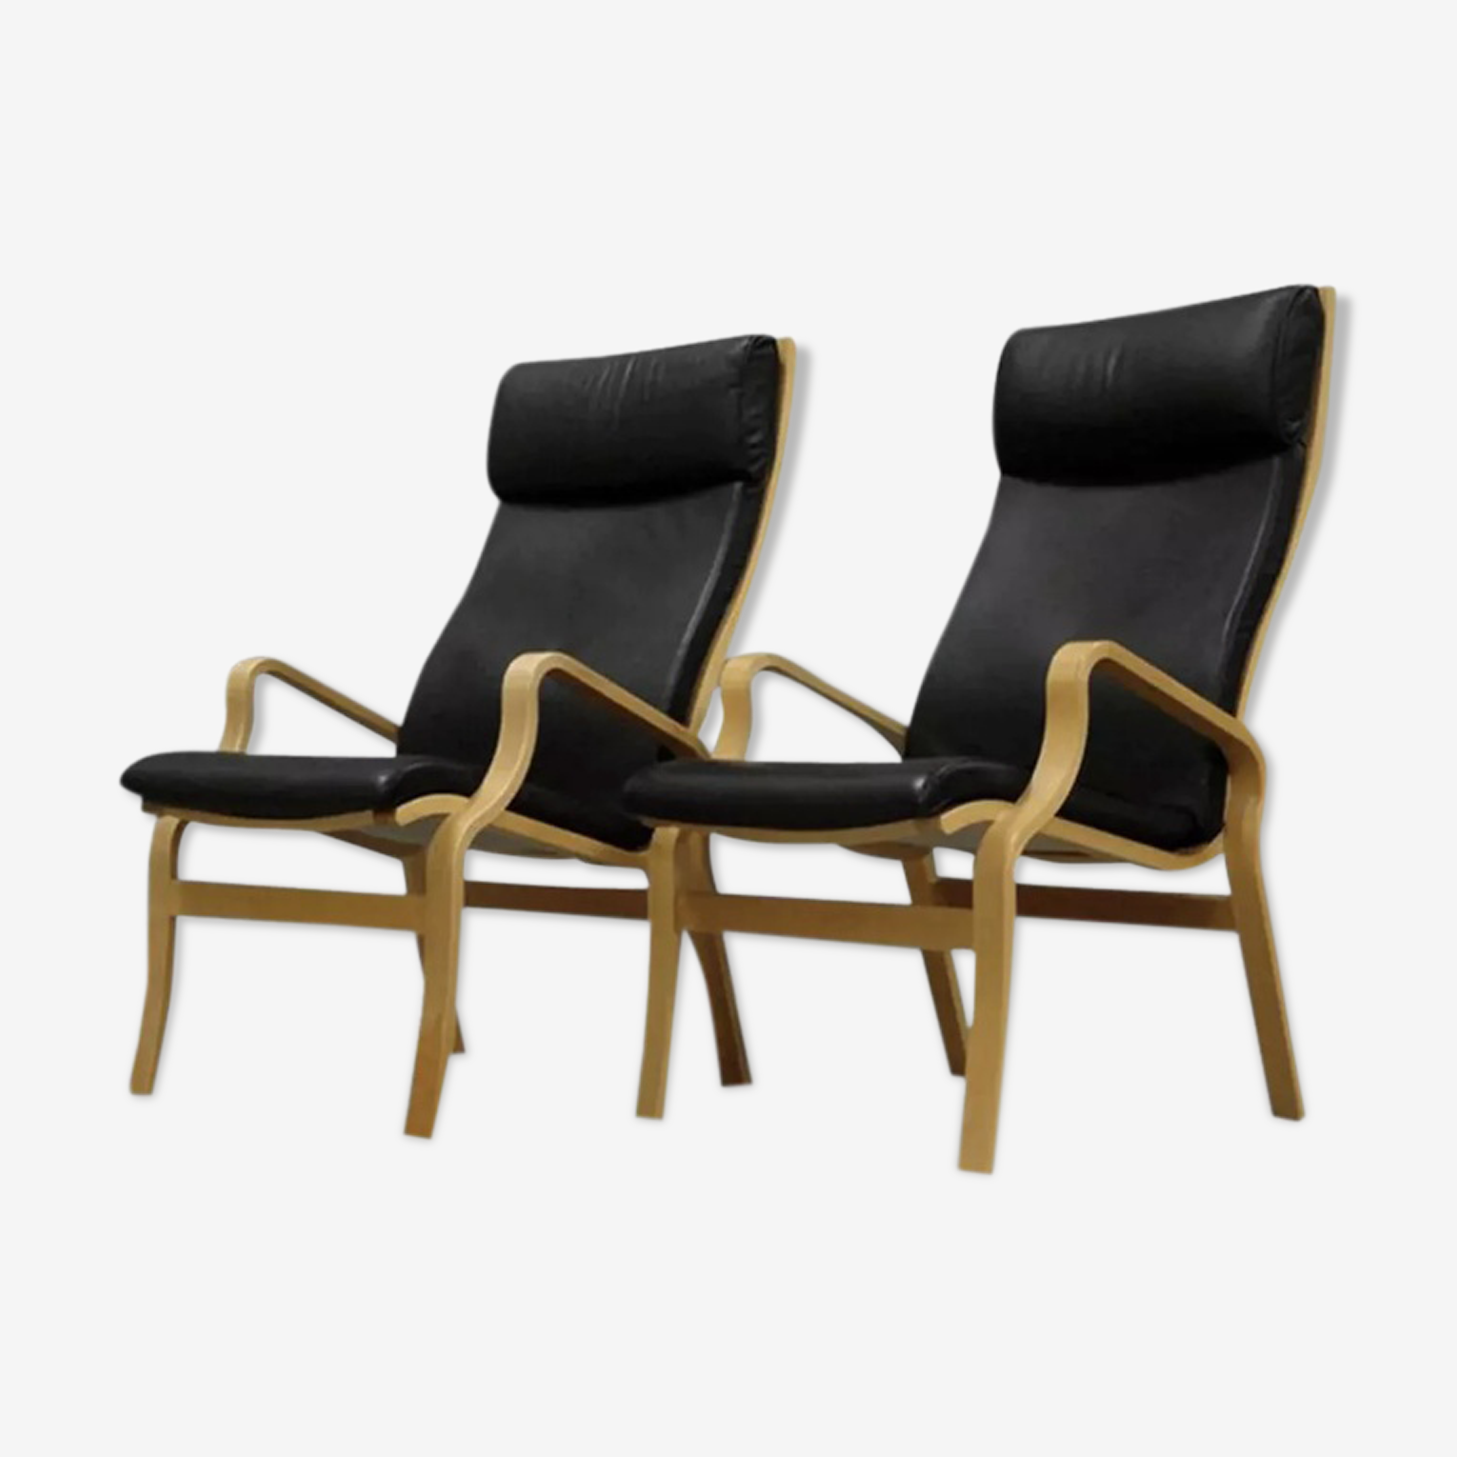 Paire de fauteuils en cuir 1970